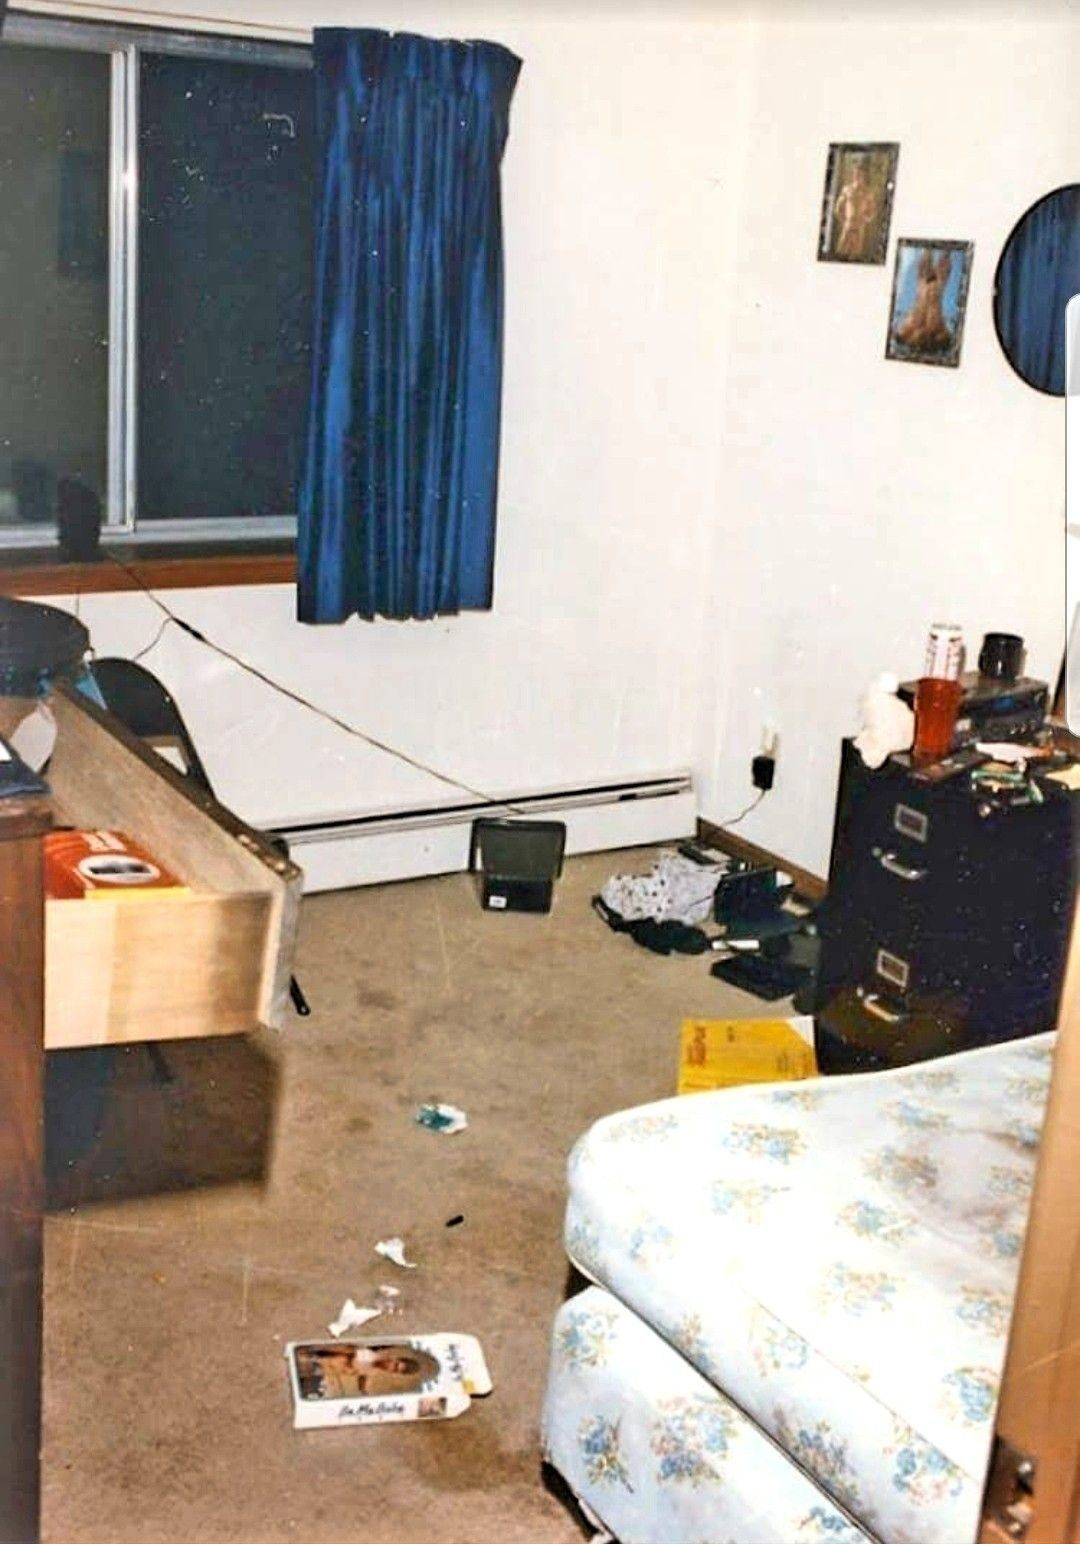 Jeffrey dahmer crime scene photos and.polaroids